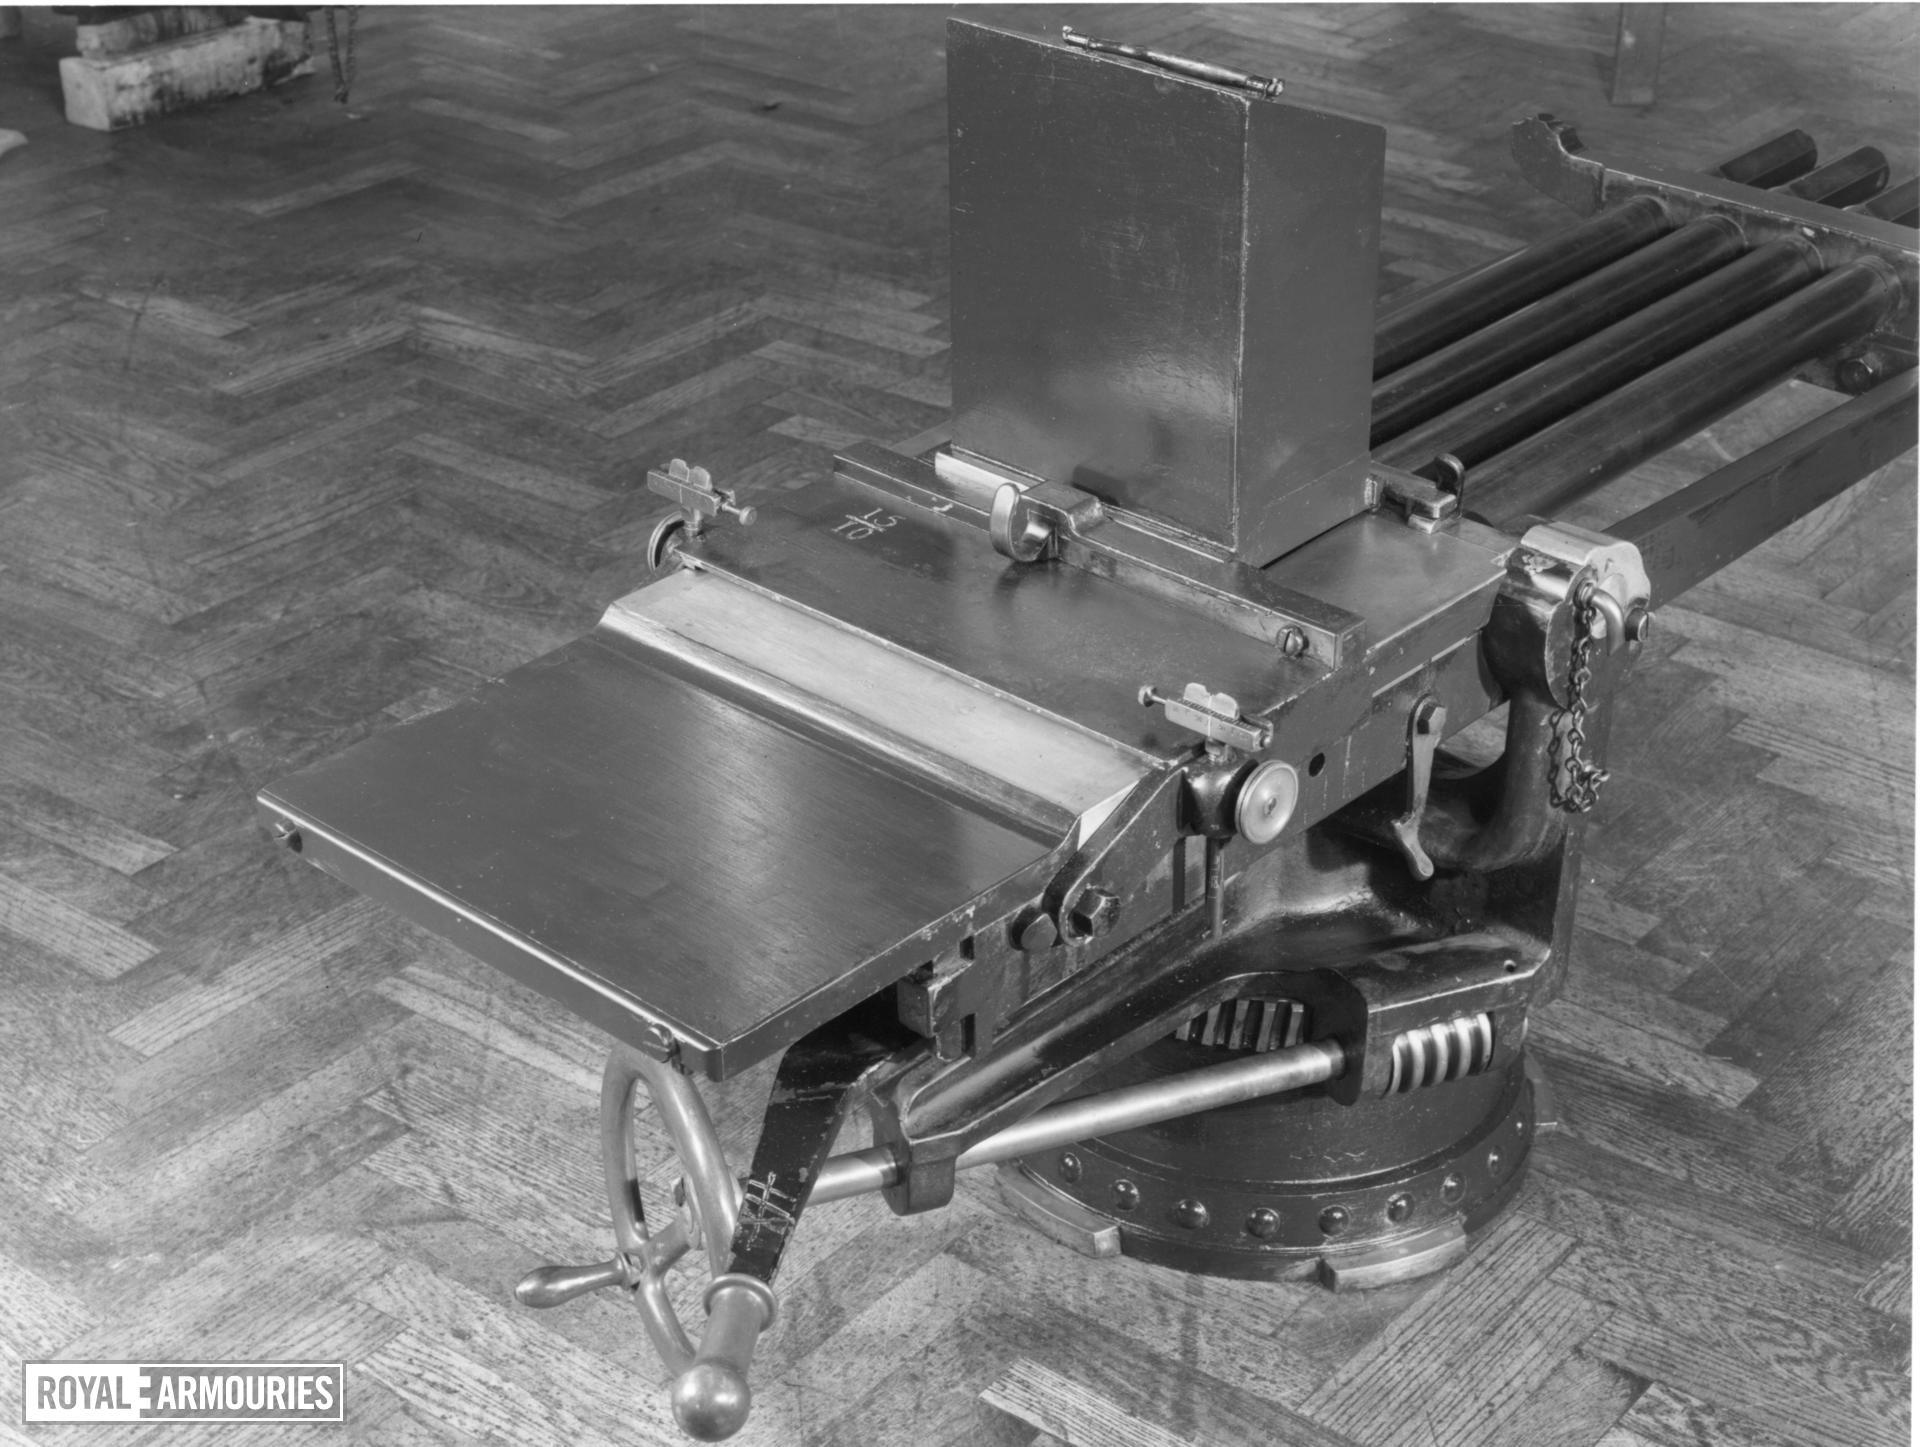 Centrefire hand operated machine gun - Nordenfelt Four barrelled heavy calibre model